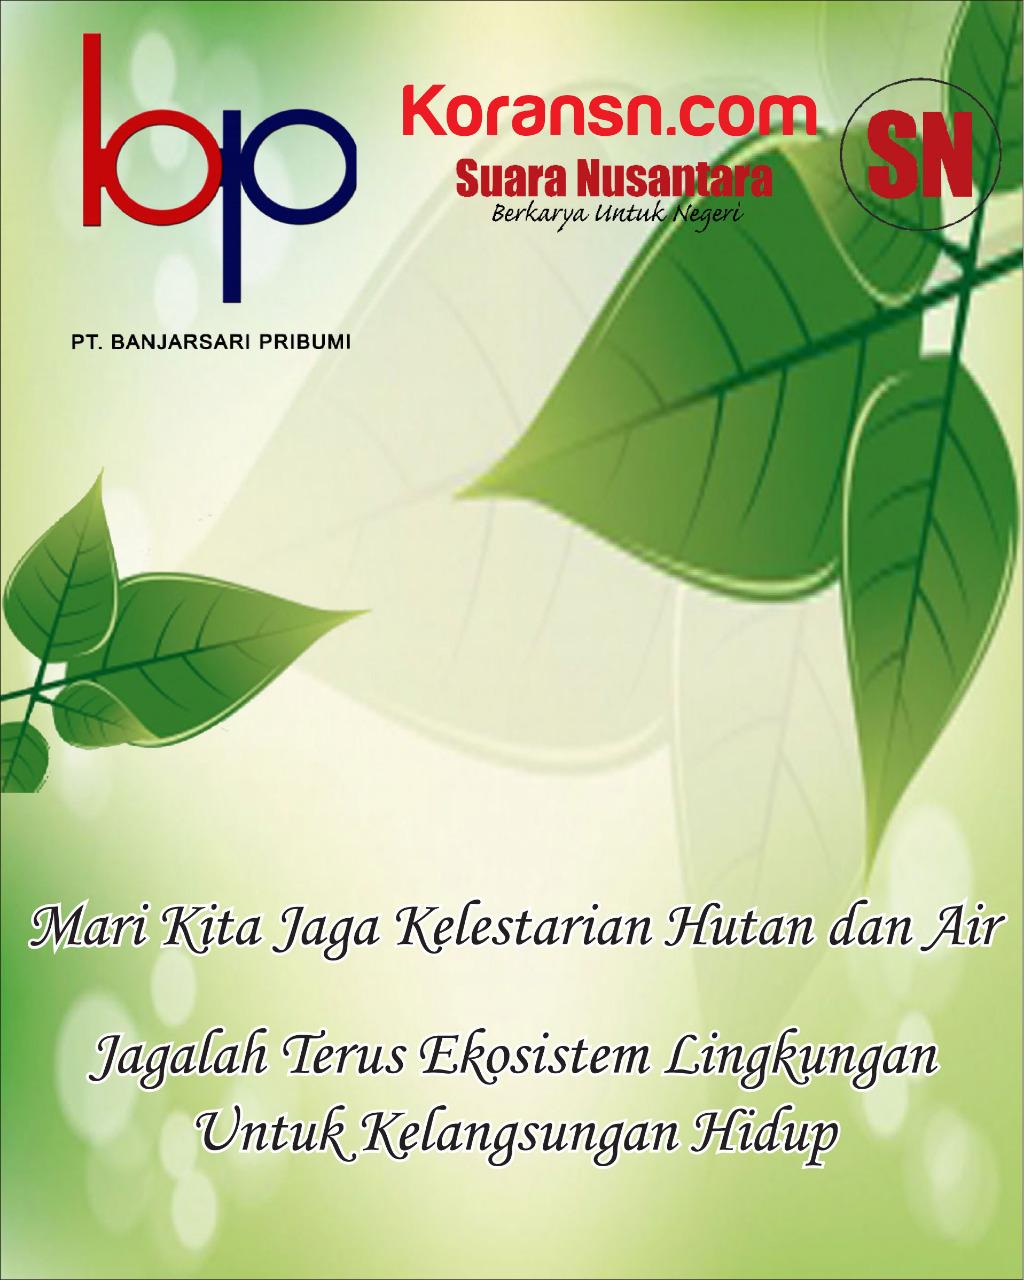 Iklan Banjarsari Pribumi